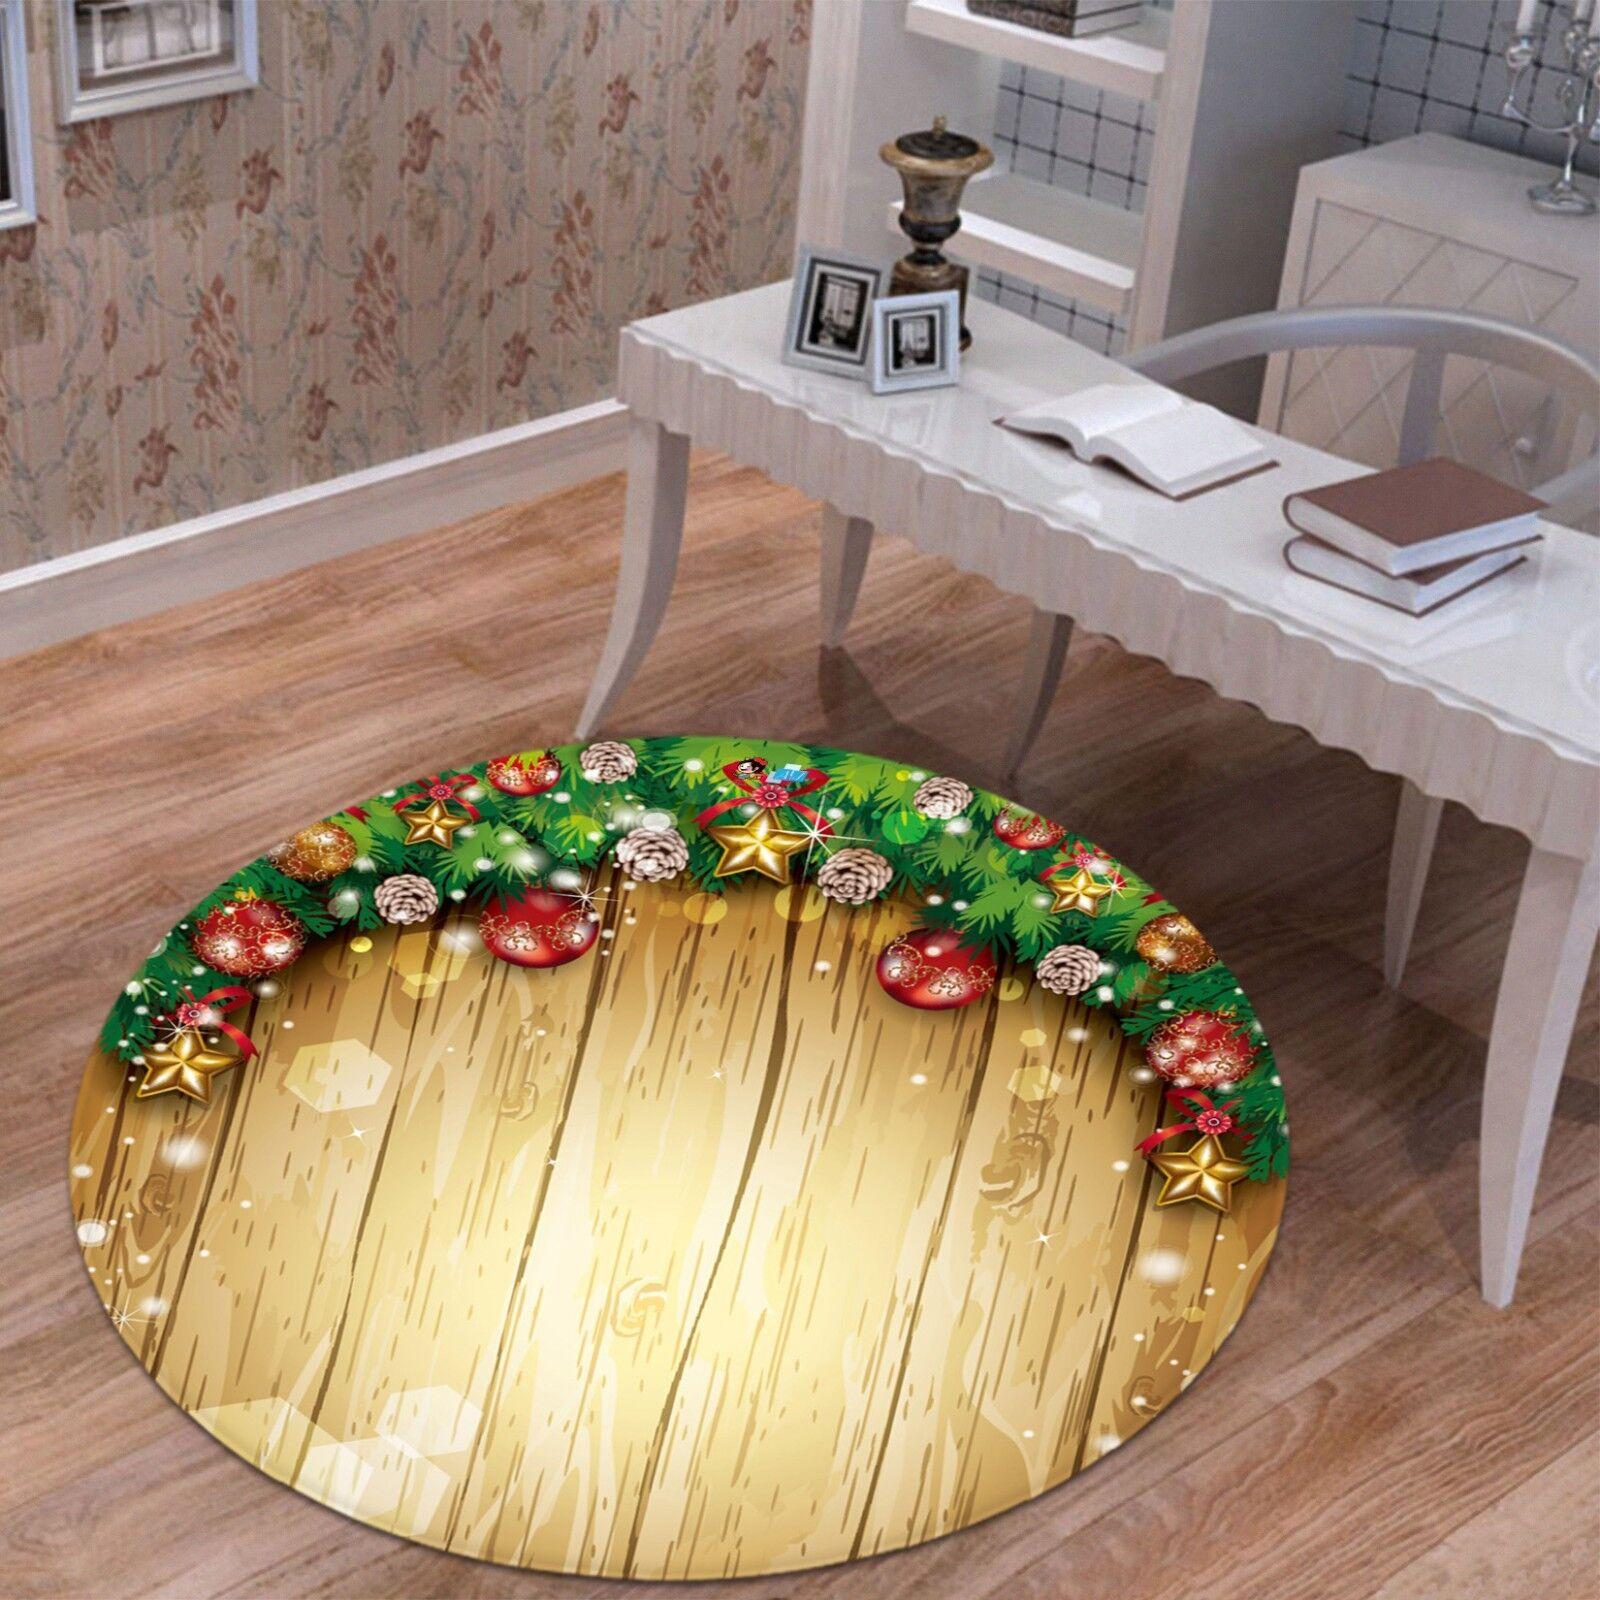 3D Weihnachten Xmas 650 Rutschfest Teppich Matte Raum Runden Runden Runden Elegant Teppich DE a459b8